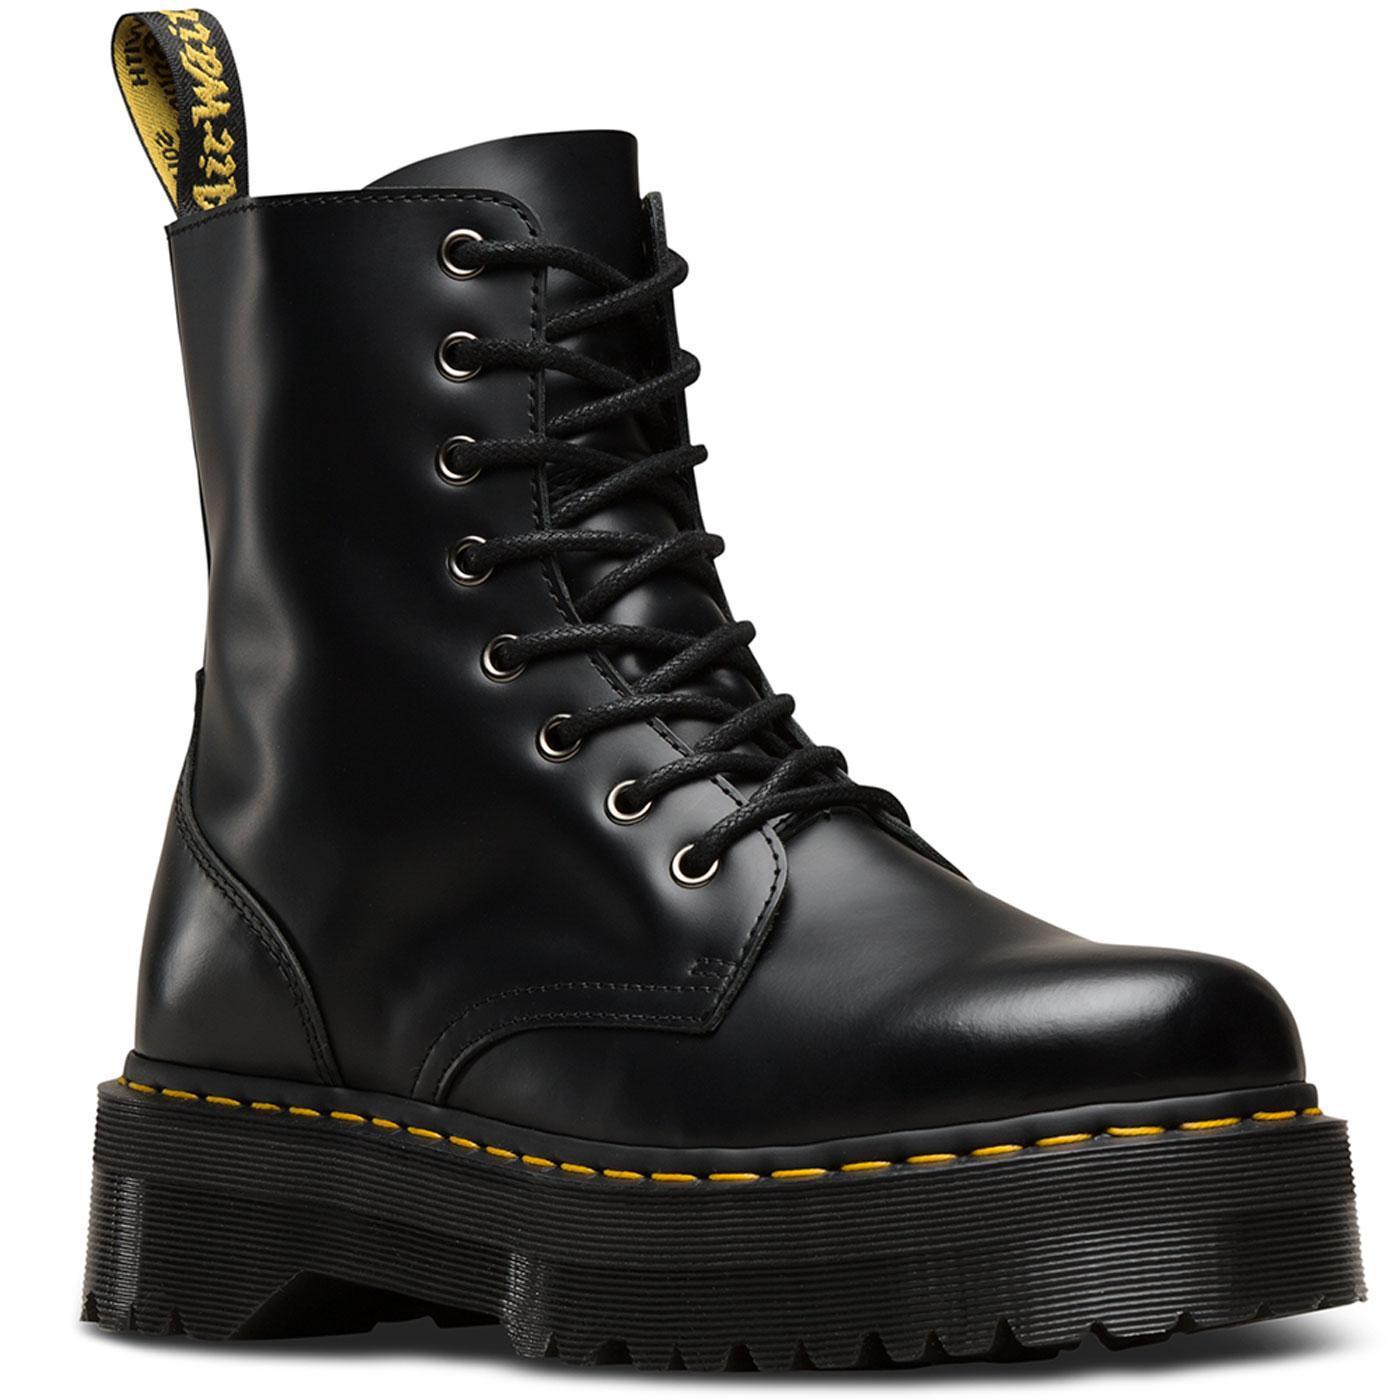 bfb1684a7c7 DR MARTENS  Jadon  Women s Punk Platform Boots in Black